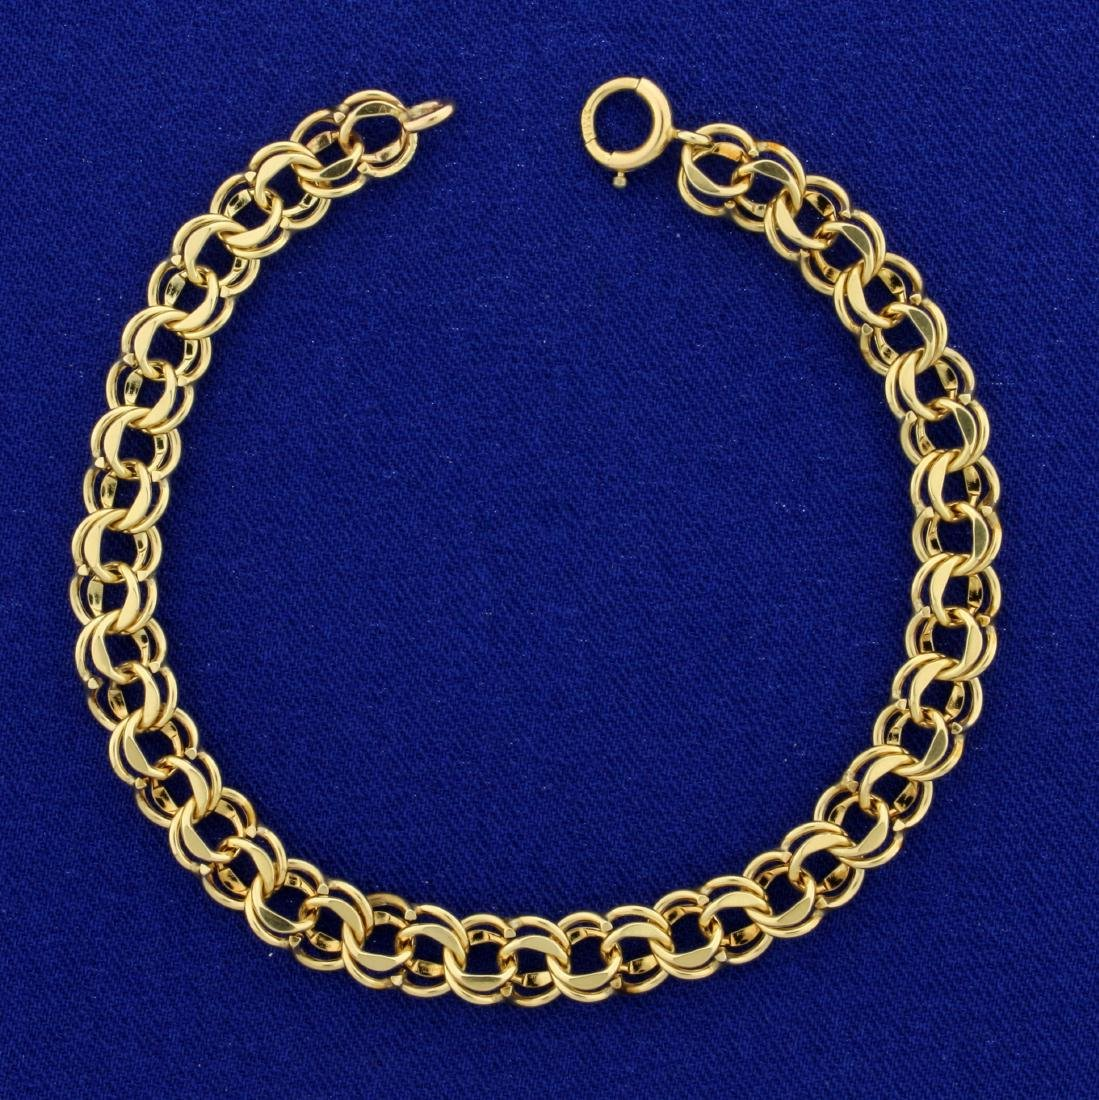 7 1/4 Inch Charm Bracelet in 14K Yellow Gold